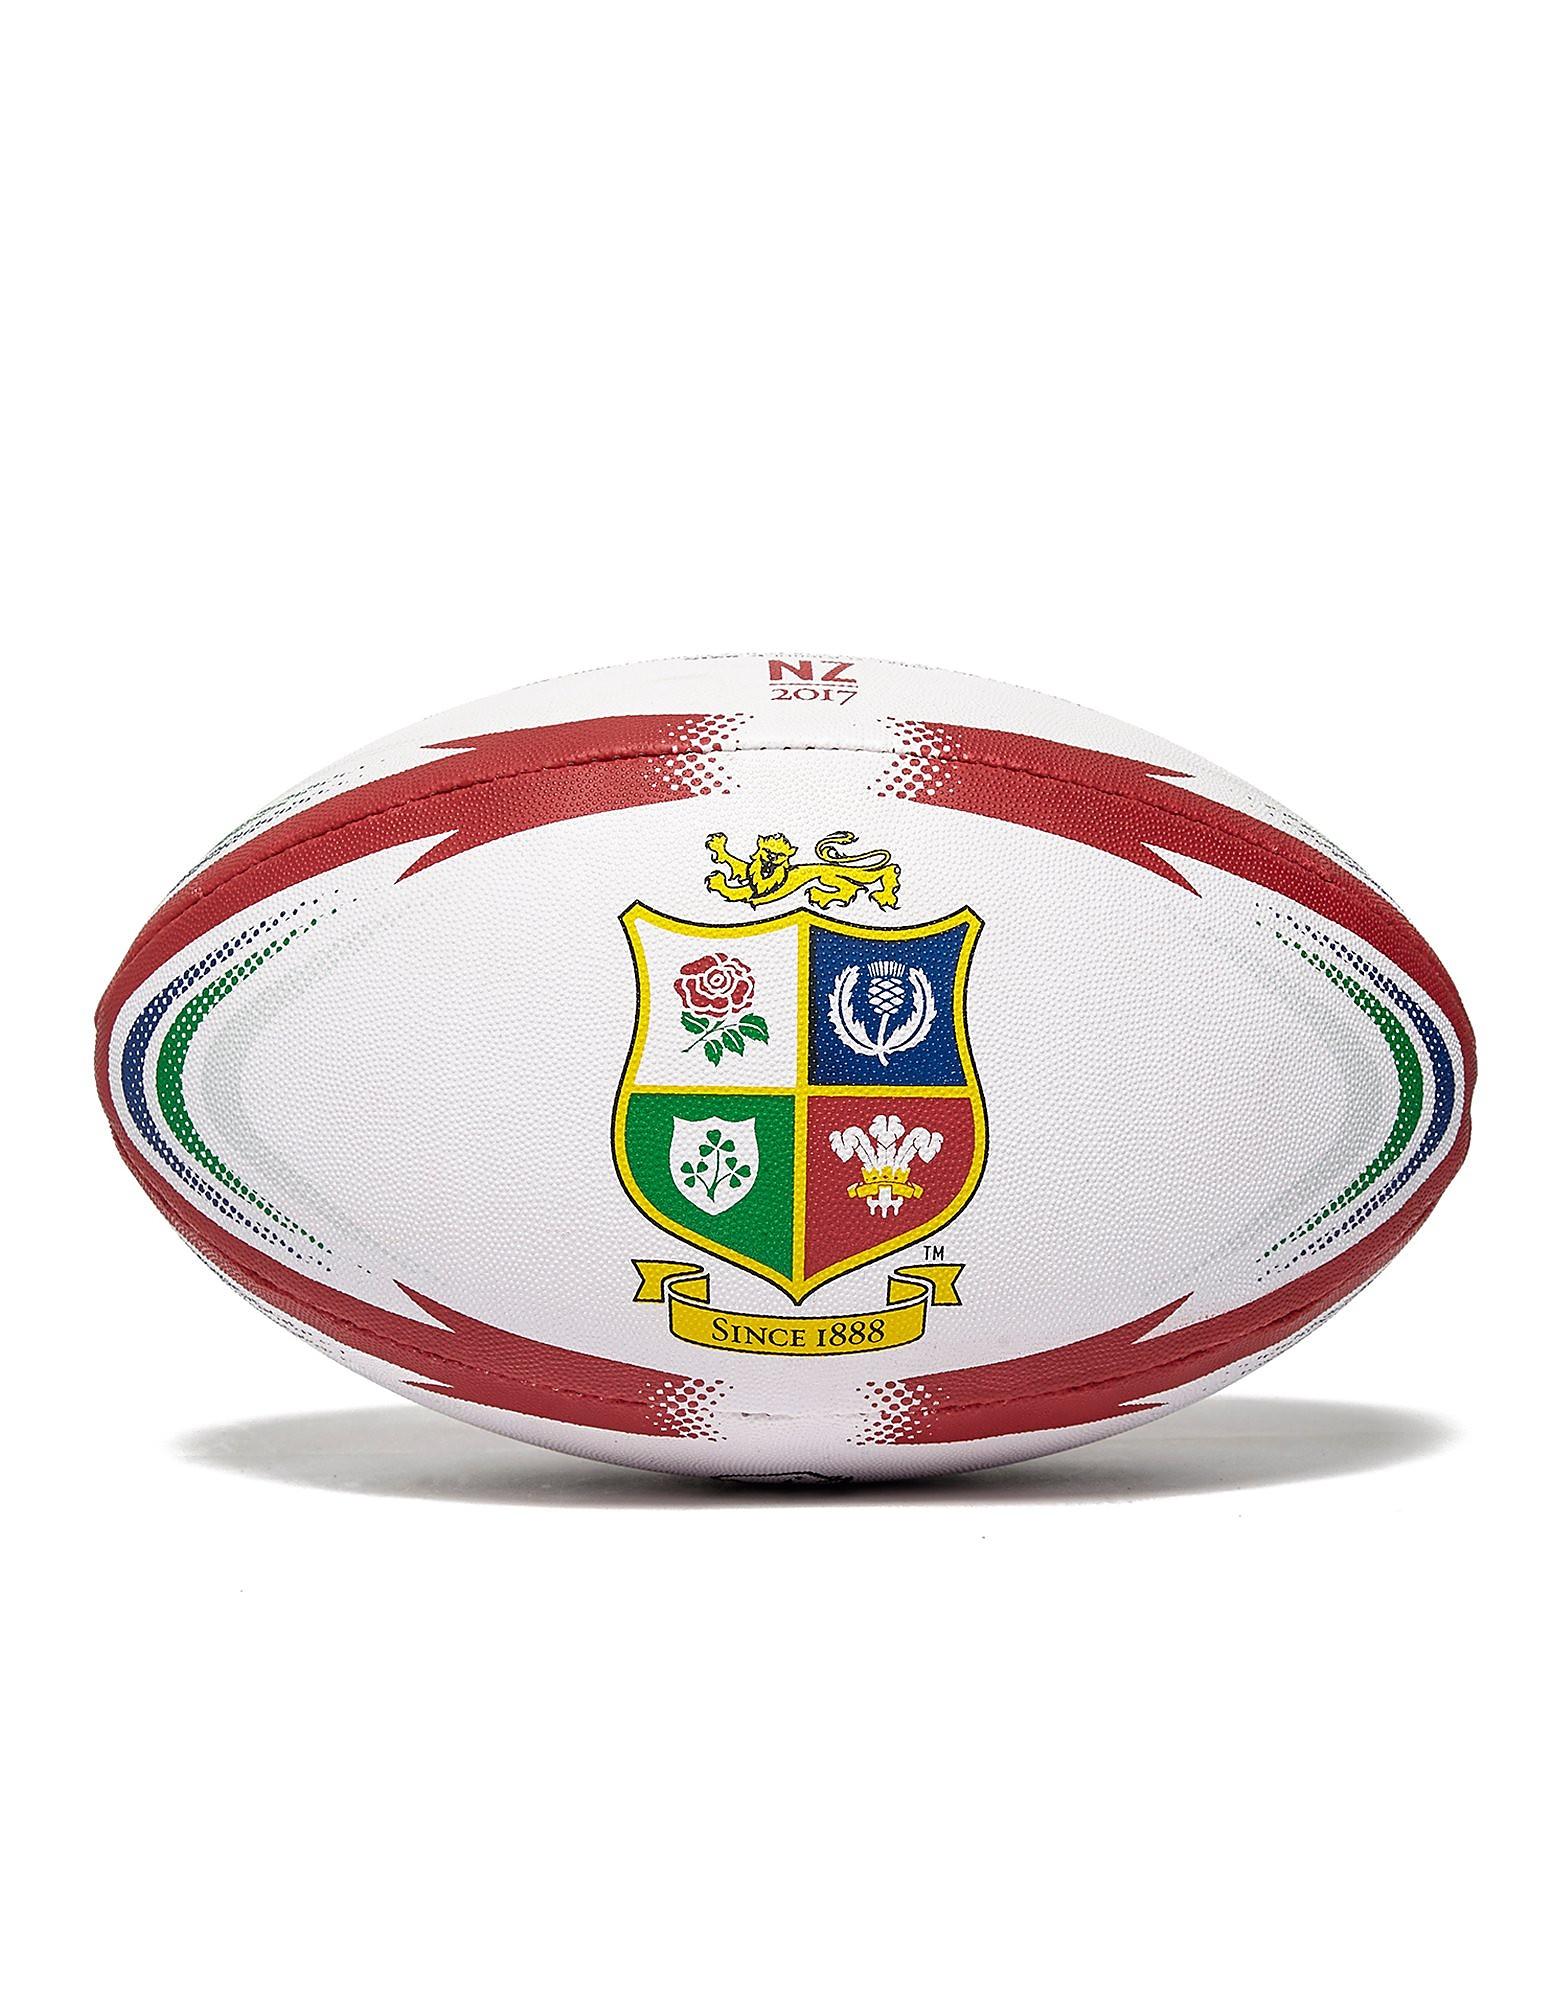 Rhino teamwear British & Irish Lions Official Replica Match Rugby